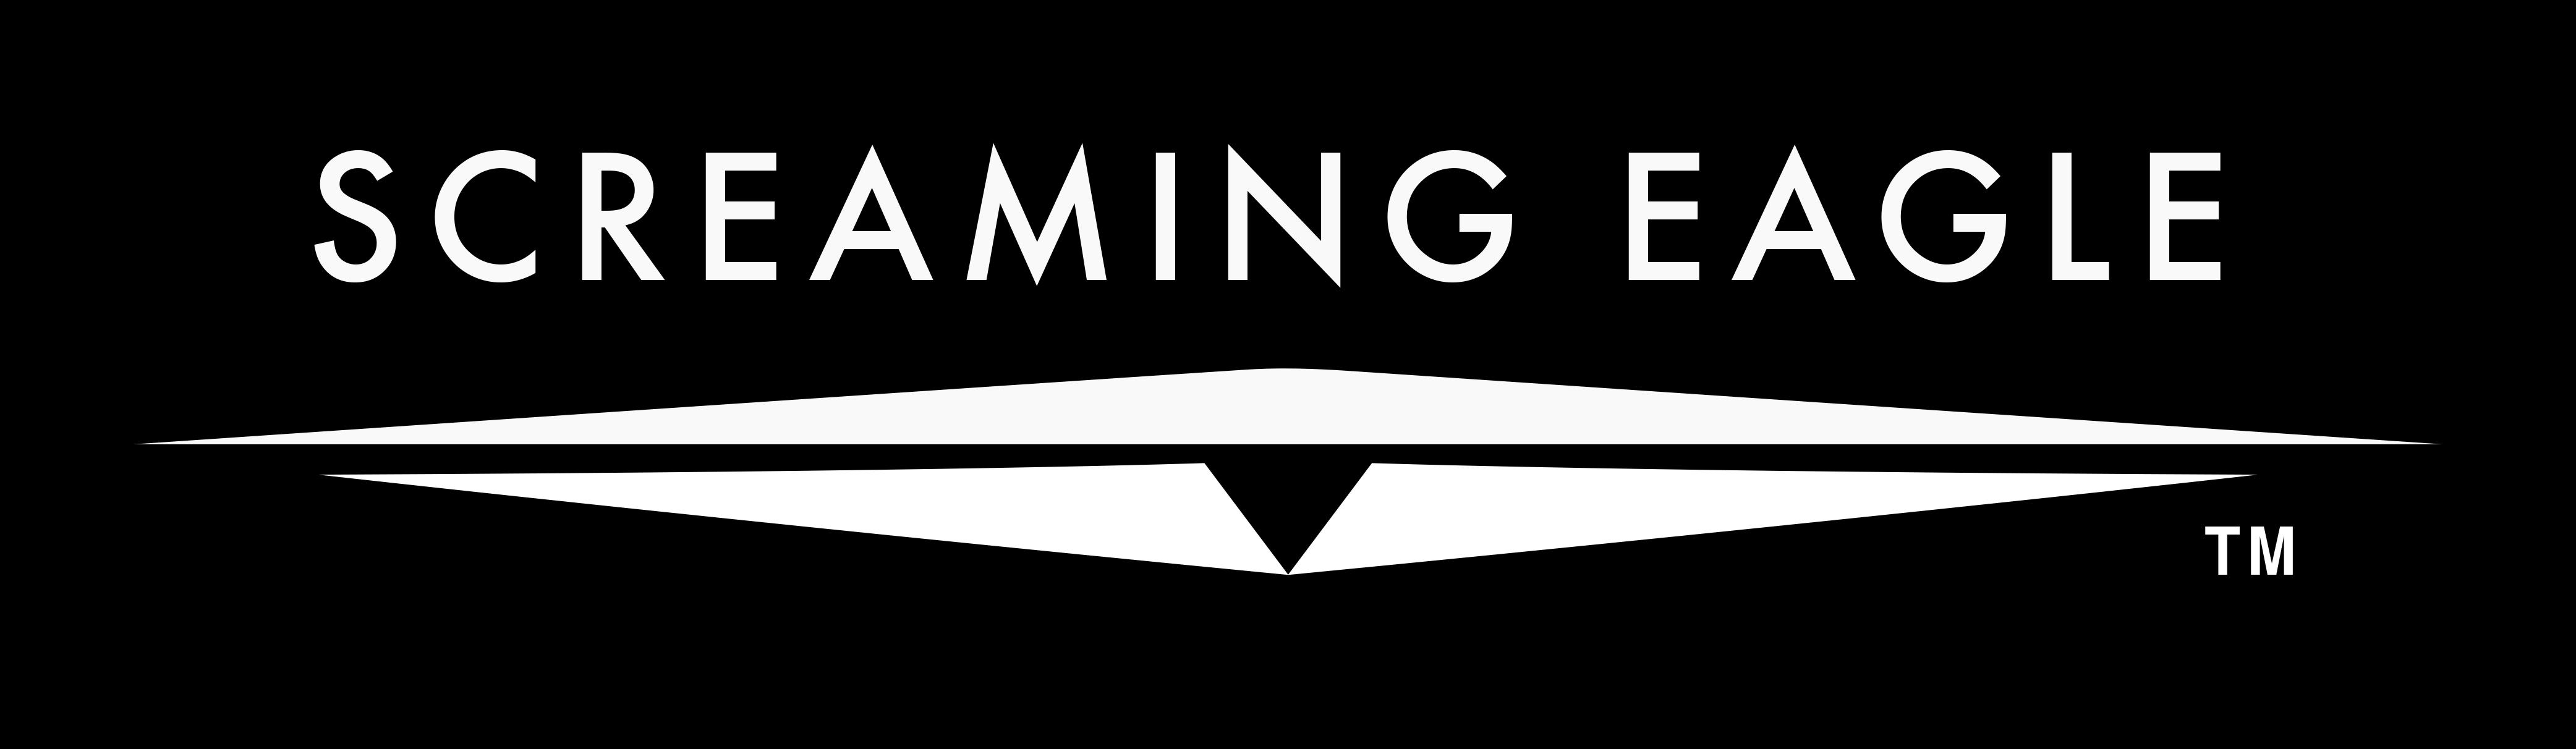 Screaming-Eagle Brossard